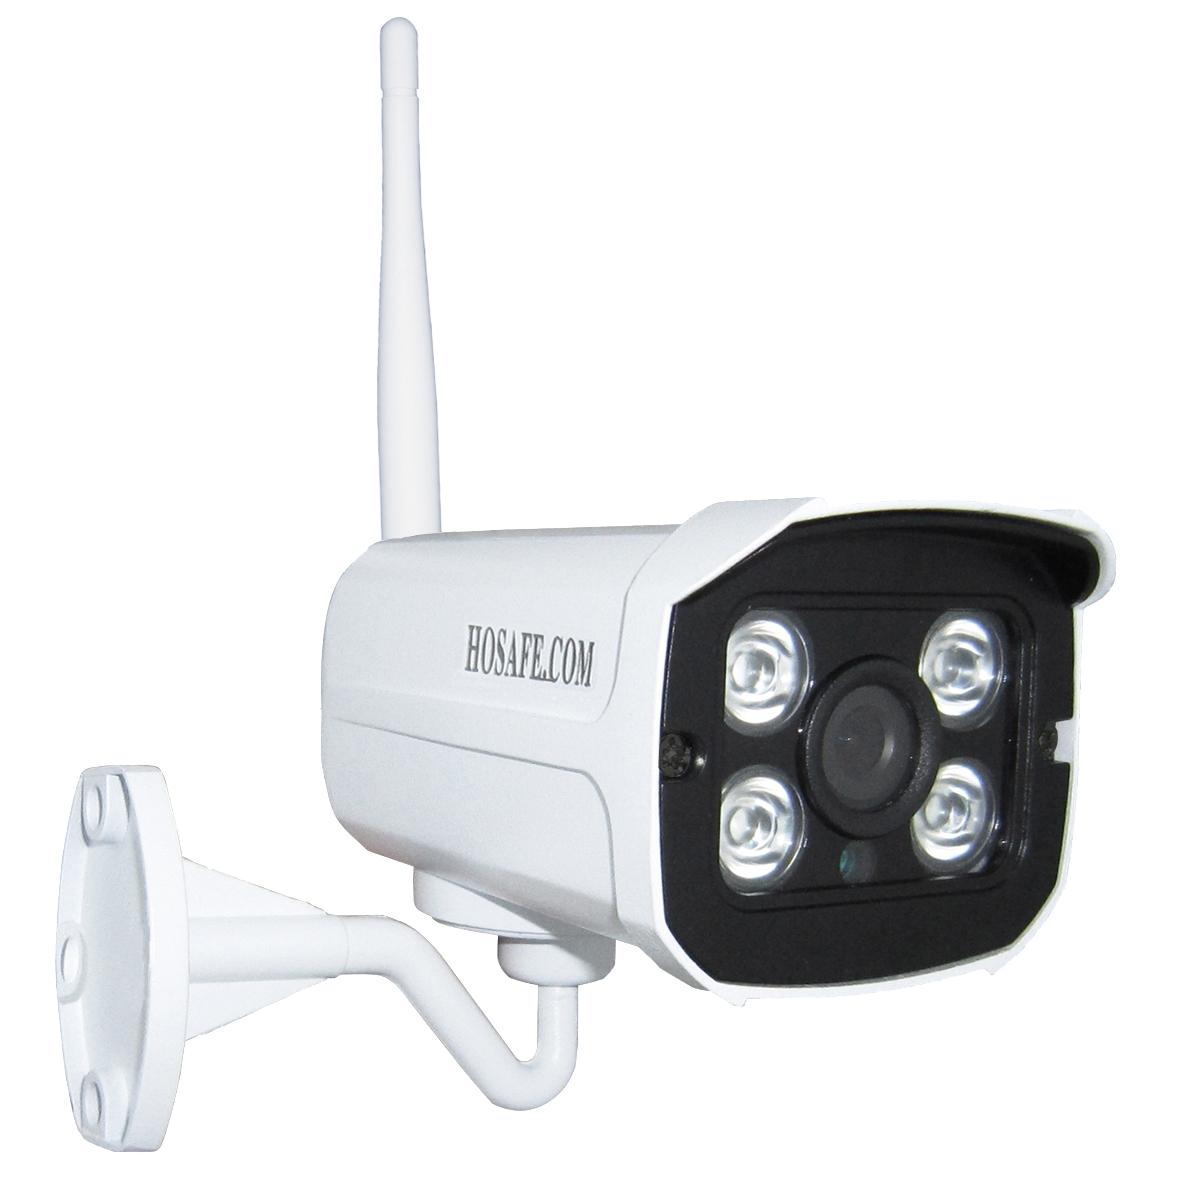 HOSAFECOM Евровилка hosafe sv1mb1w 720p wireless outdoor hd ip camera w h 264 motion detection e mail alert ip66 4 led ir night vision